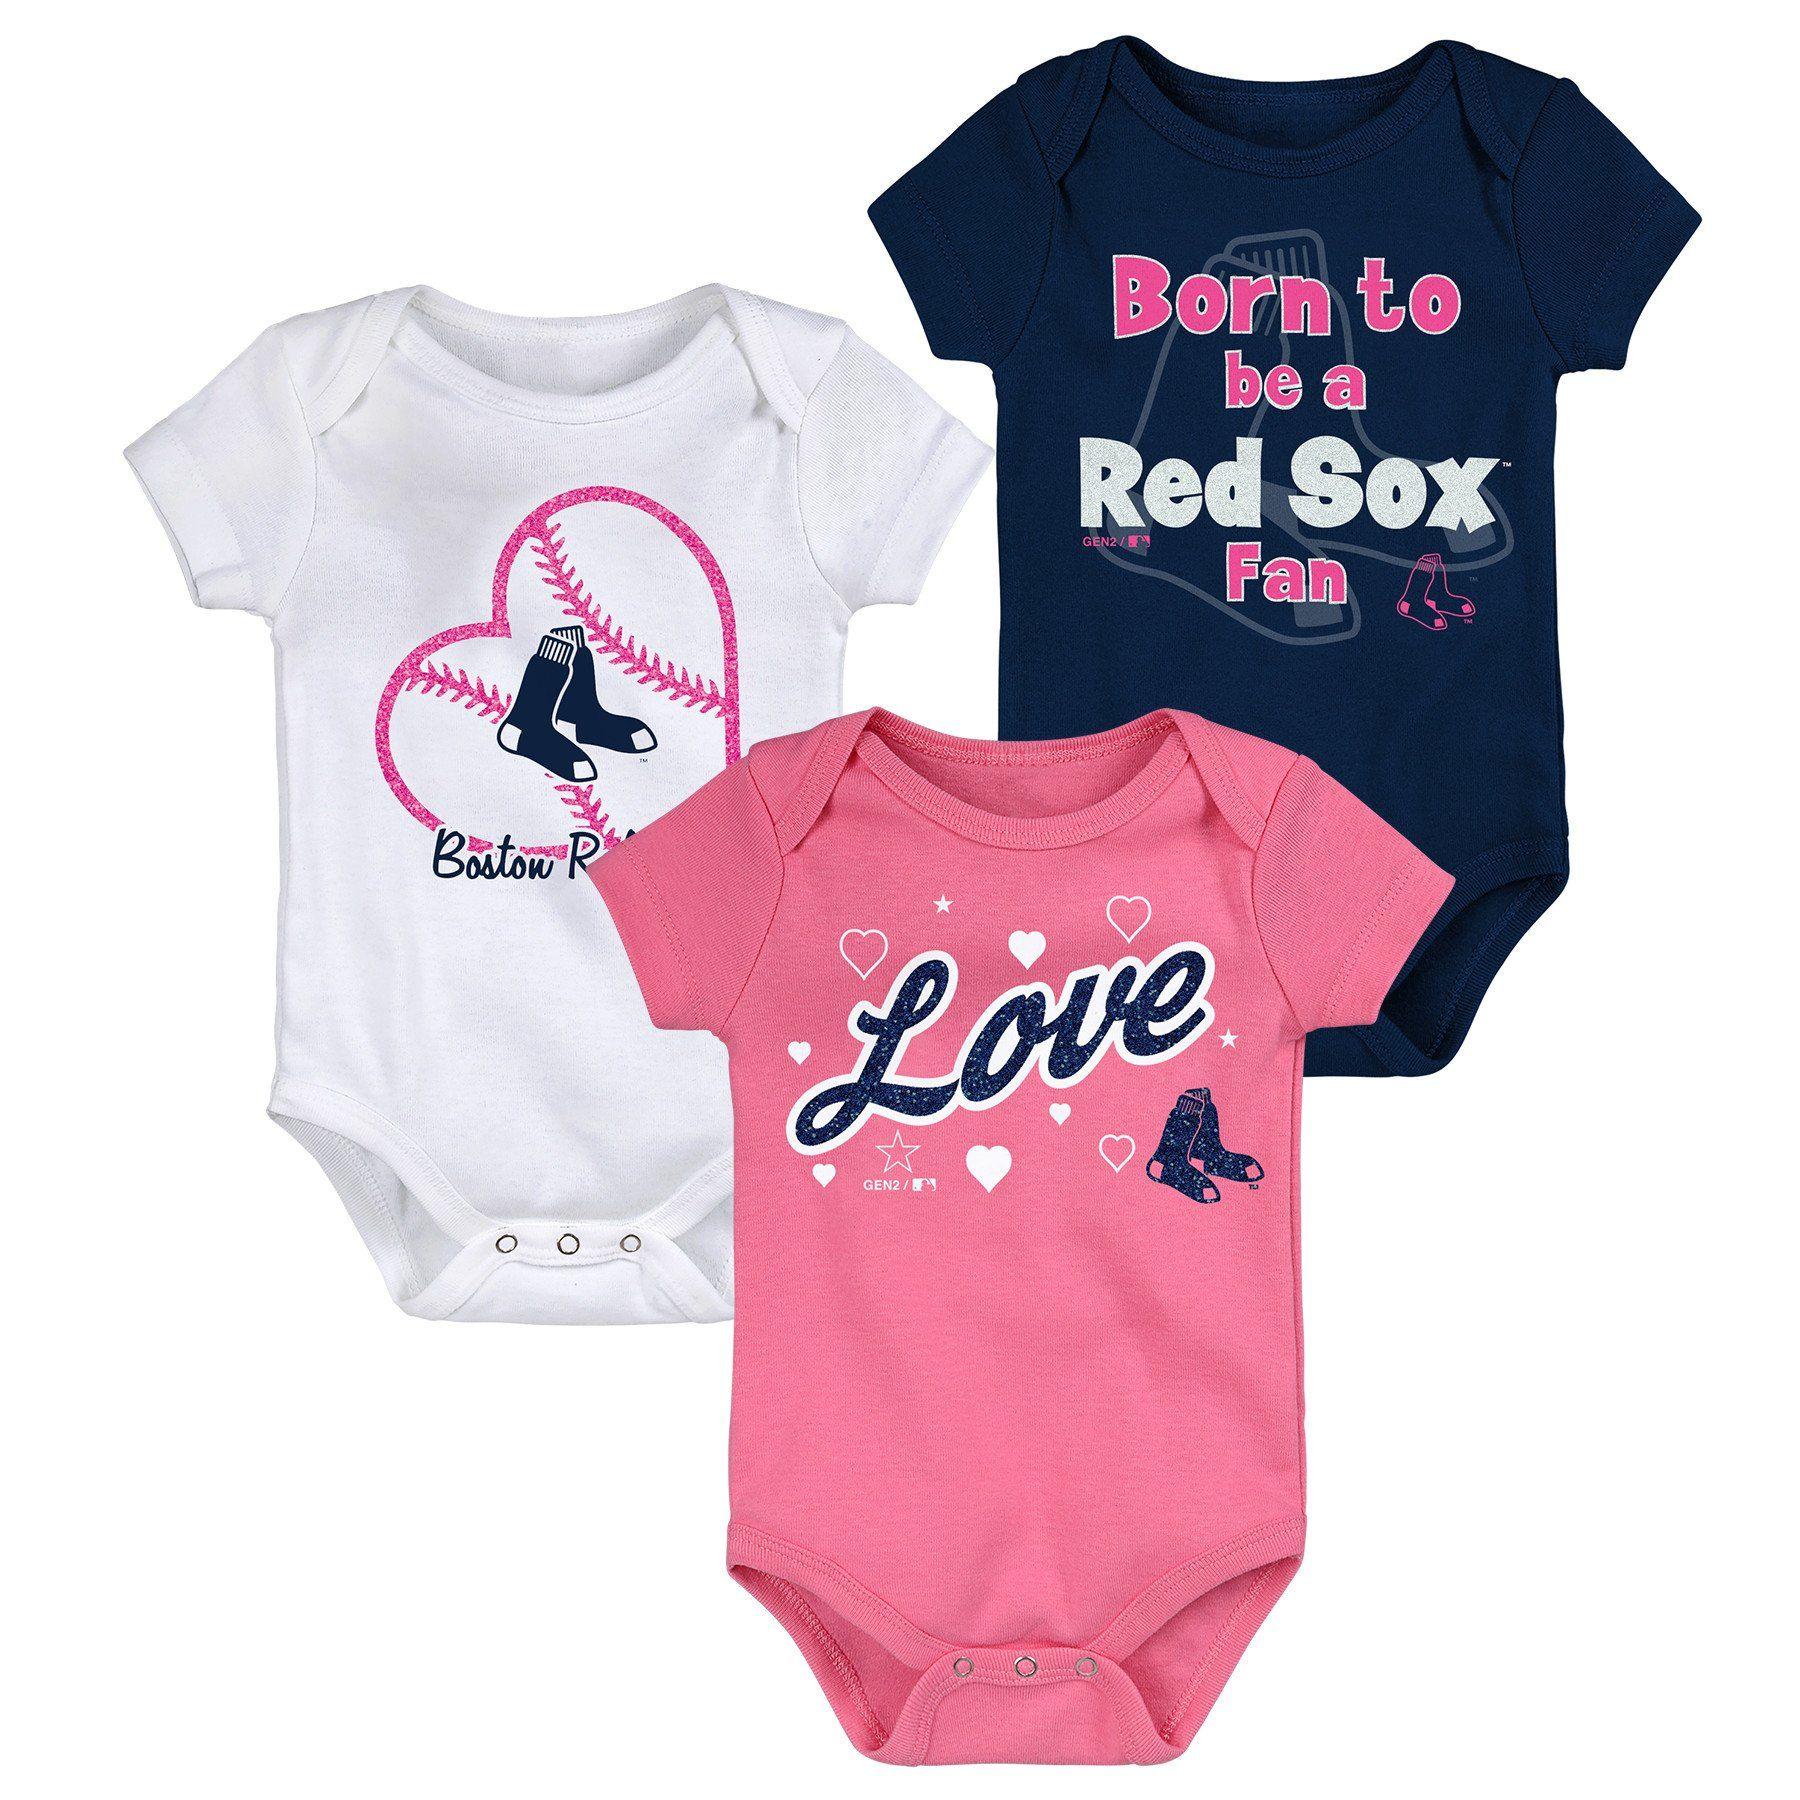 Boston Red Sox Baby Infant 2-Pack Romper Creeper Bodysuit Set Newborn